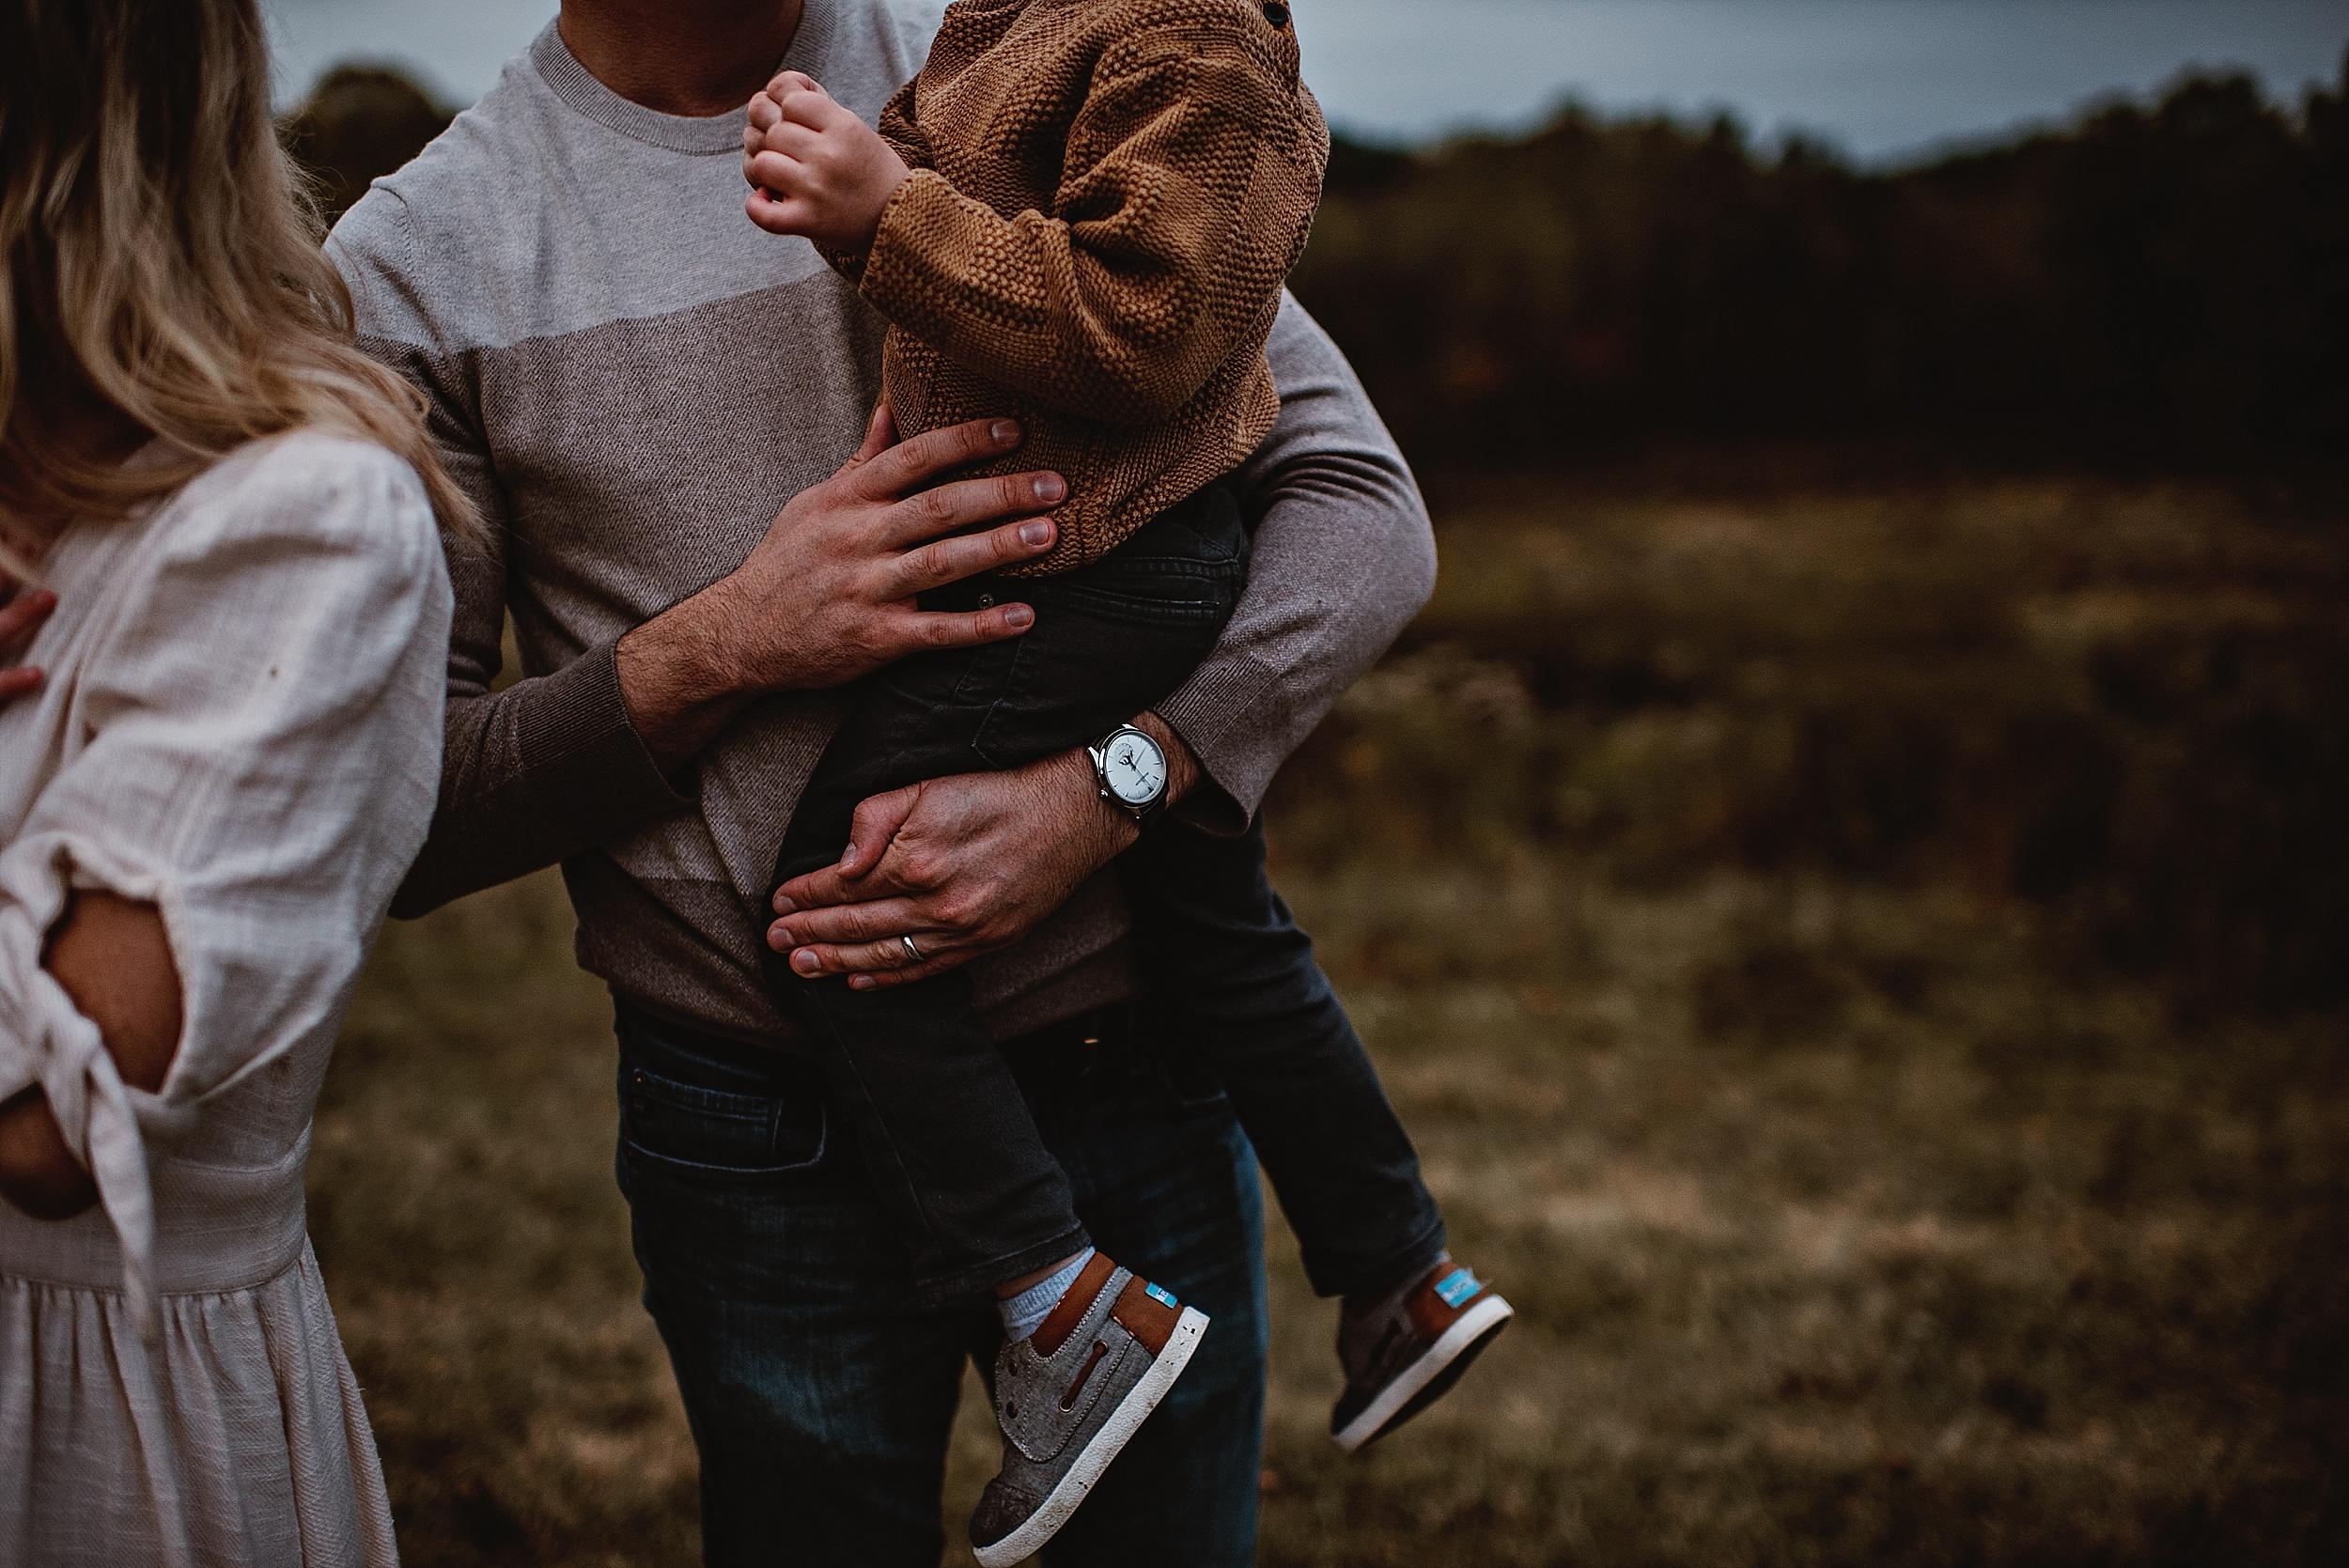 lauren-grayson-photography-portrait-artist-akron-cleveland-ohio-photographer-family-session-fields-sunset-fall_0210.jpg